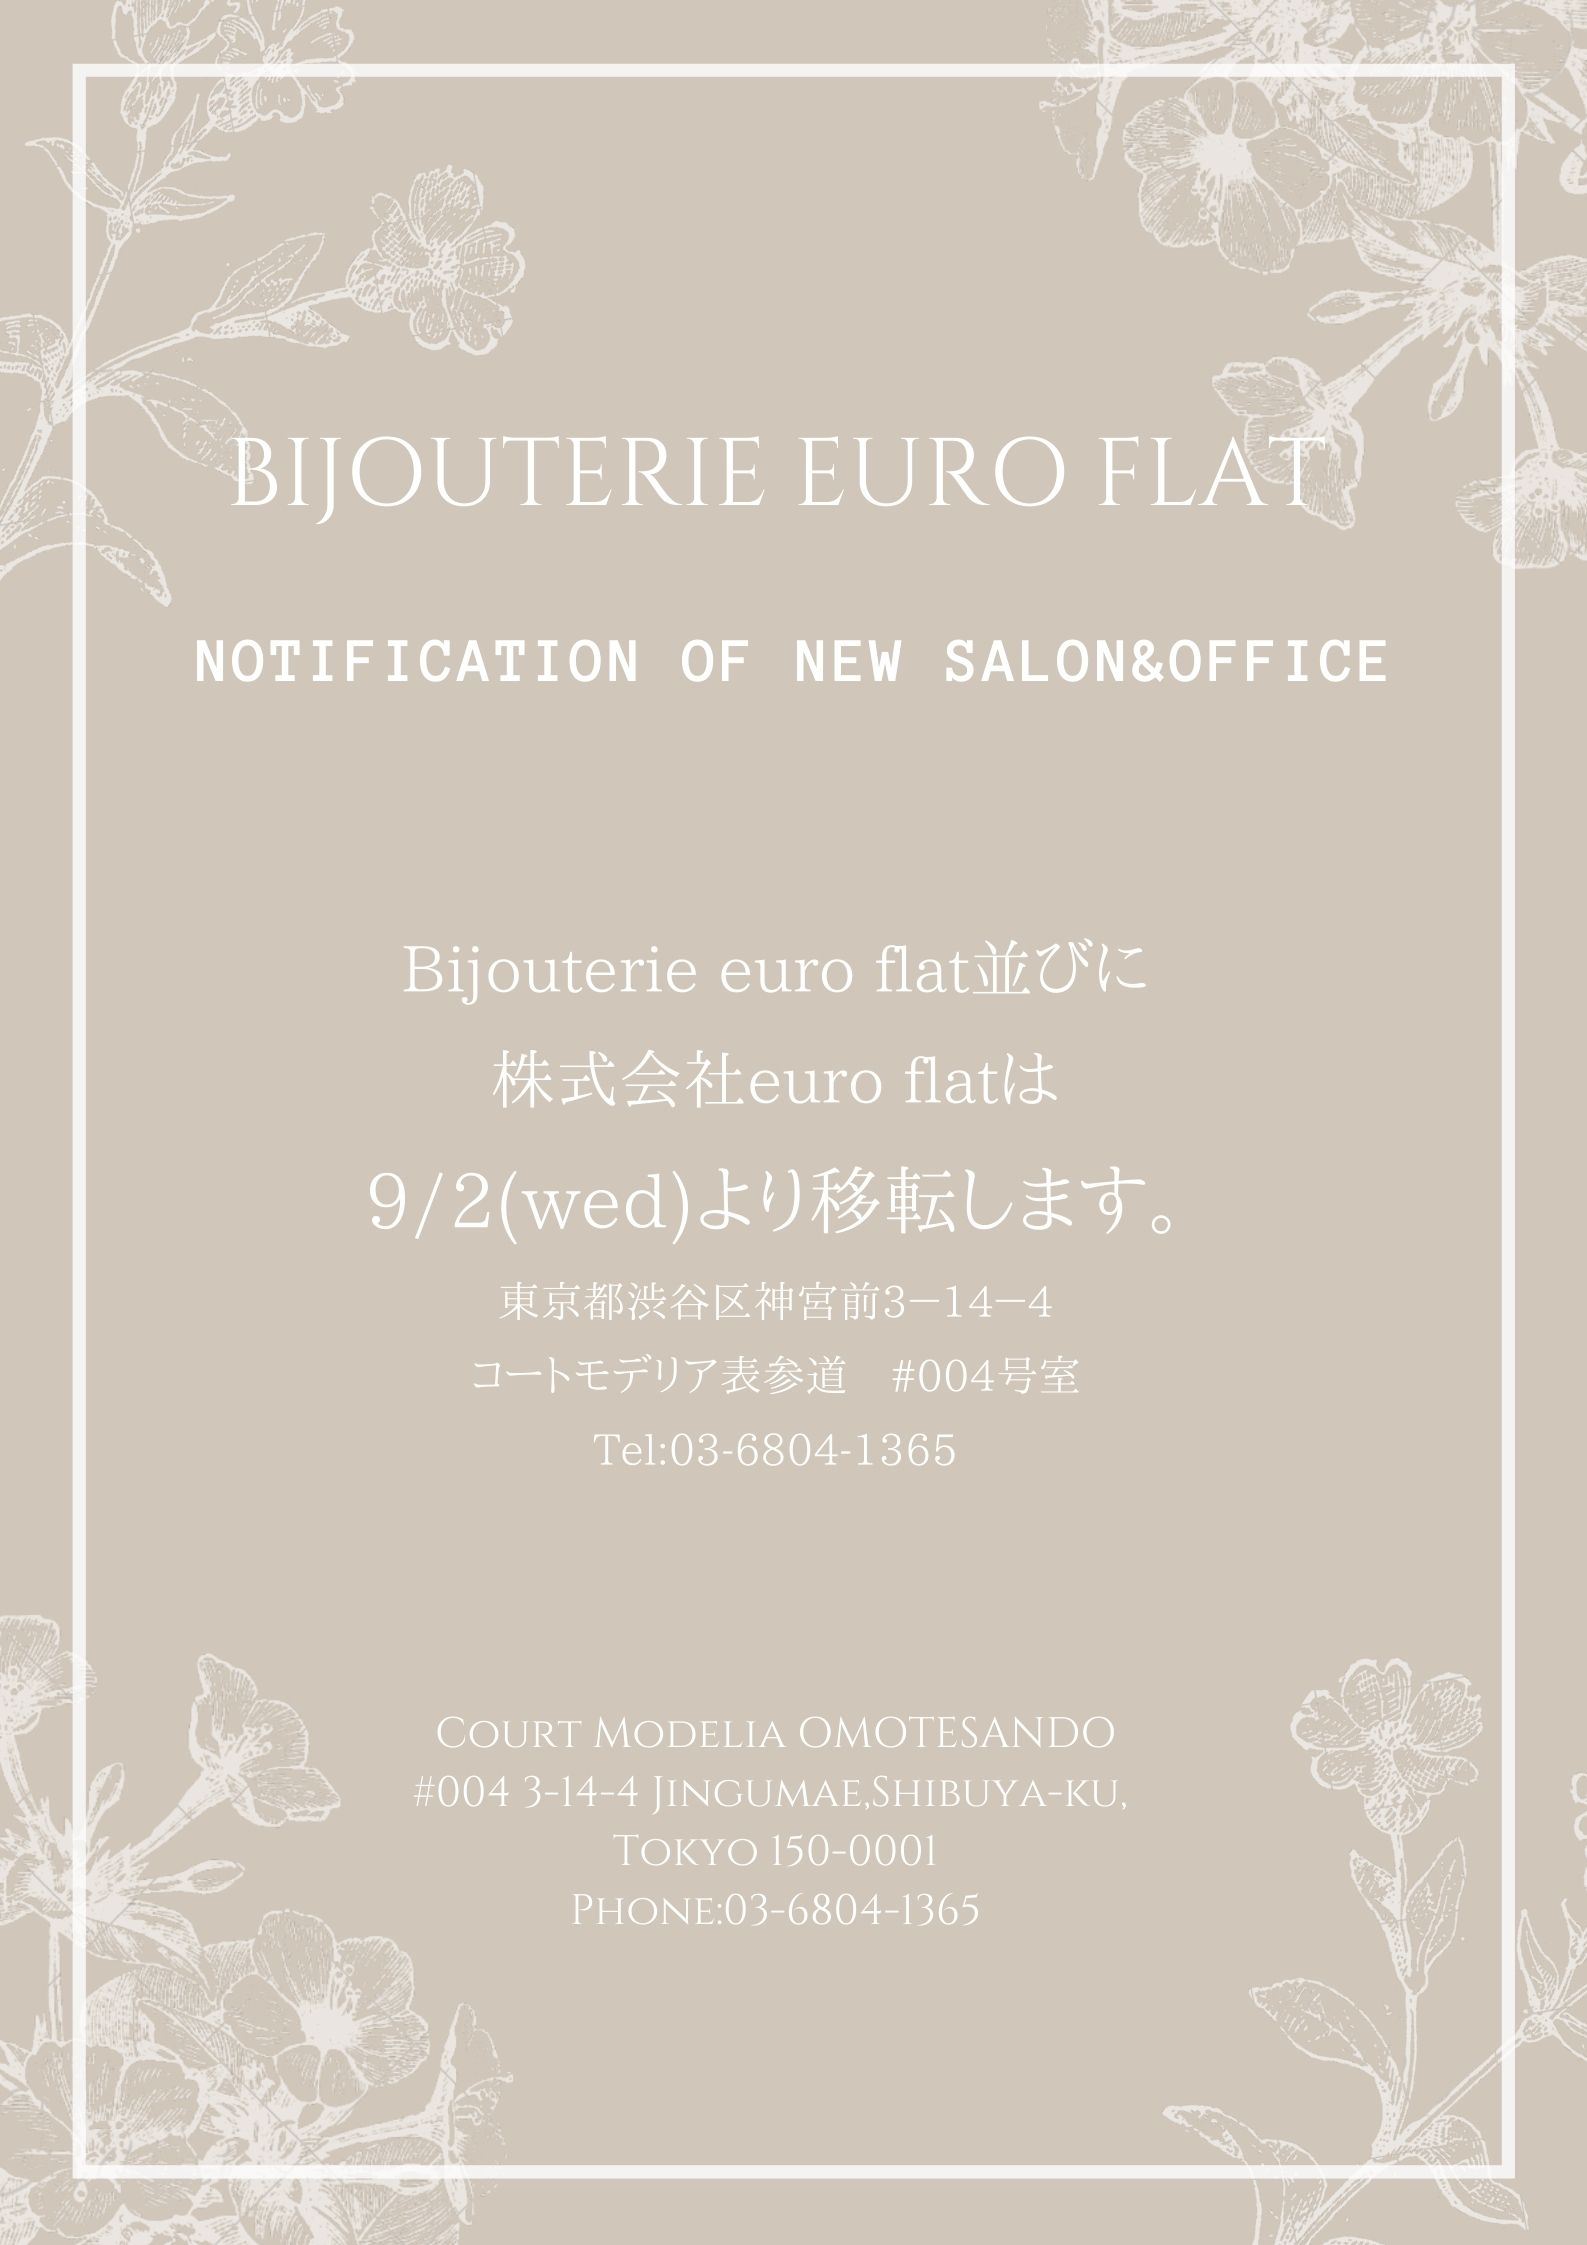 Bijouterie euro flat 及び 株式会社euro flat は 9/2 より移転します。